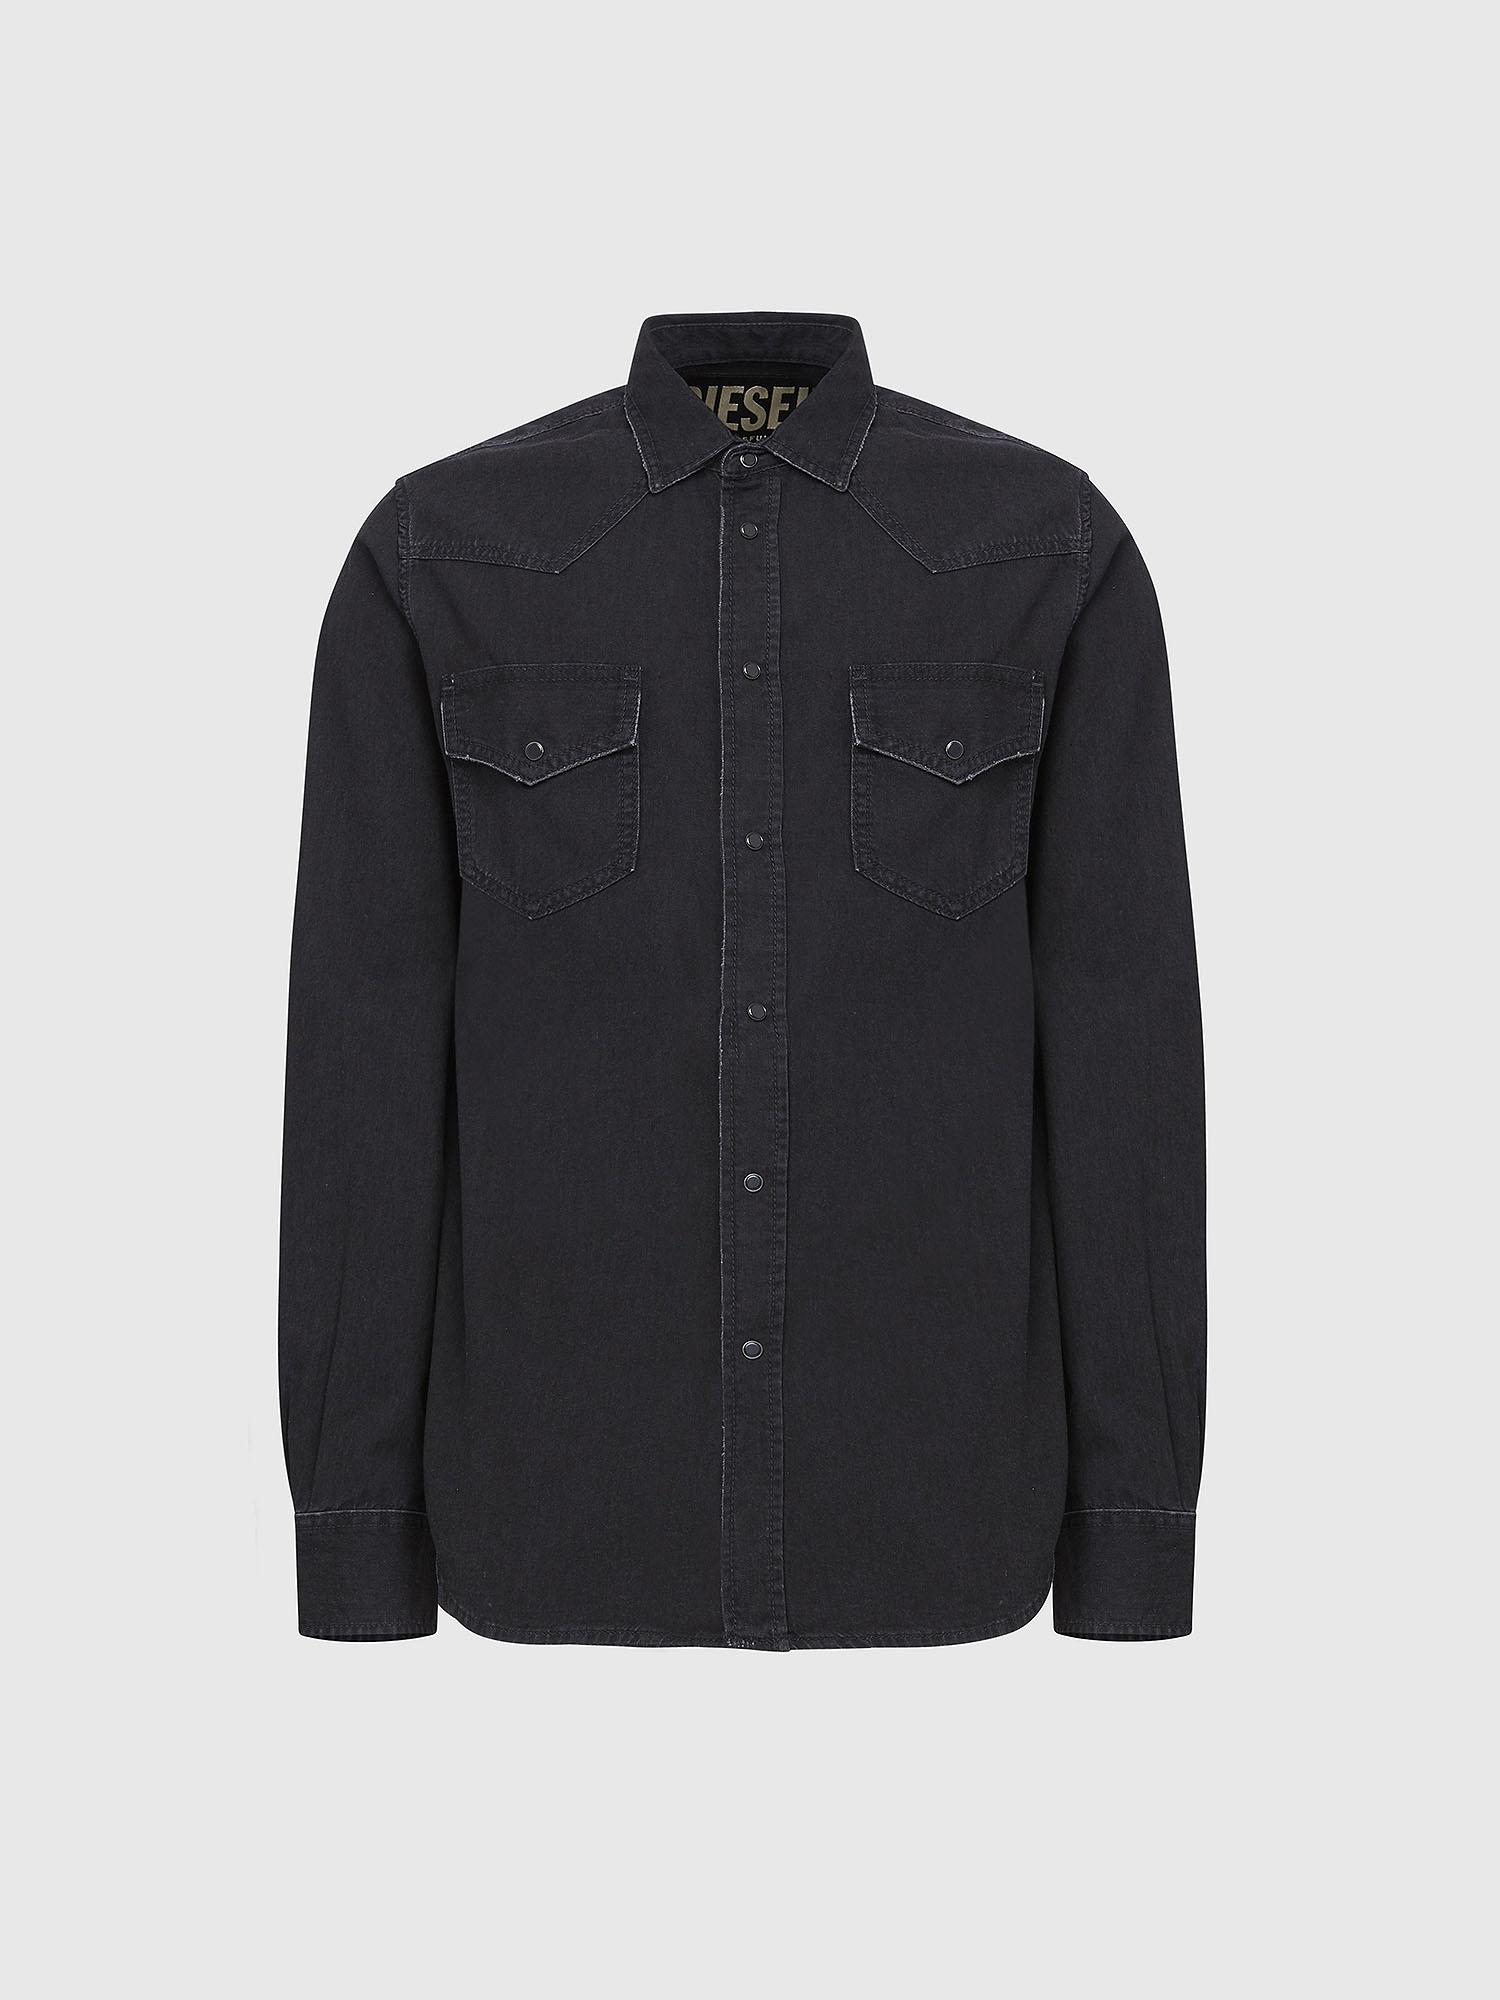 Diesel Denim Shirts 0AAUR - Black - L